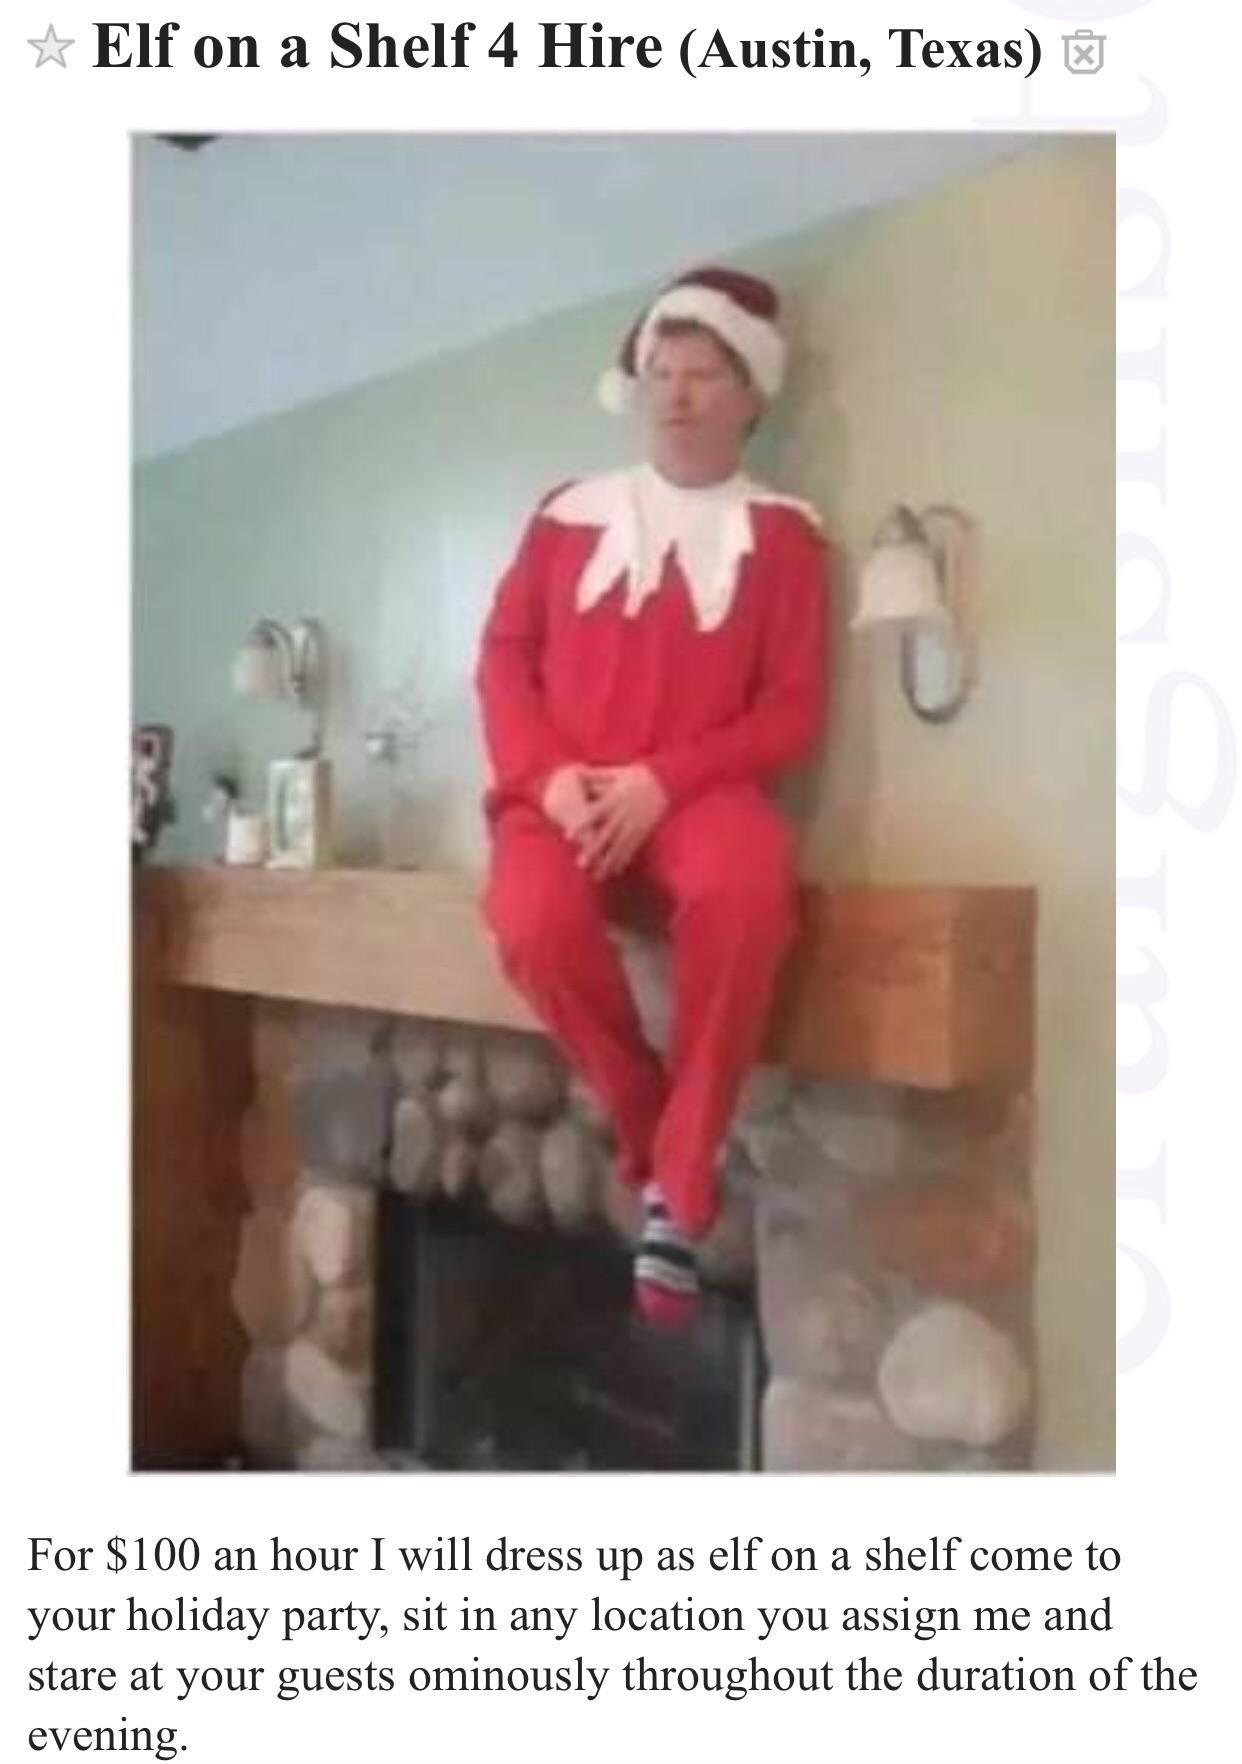 Elf on a Shelf 4 Hire